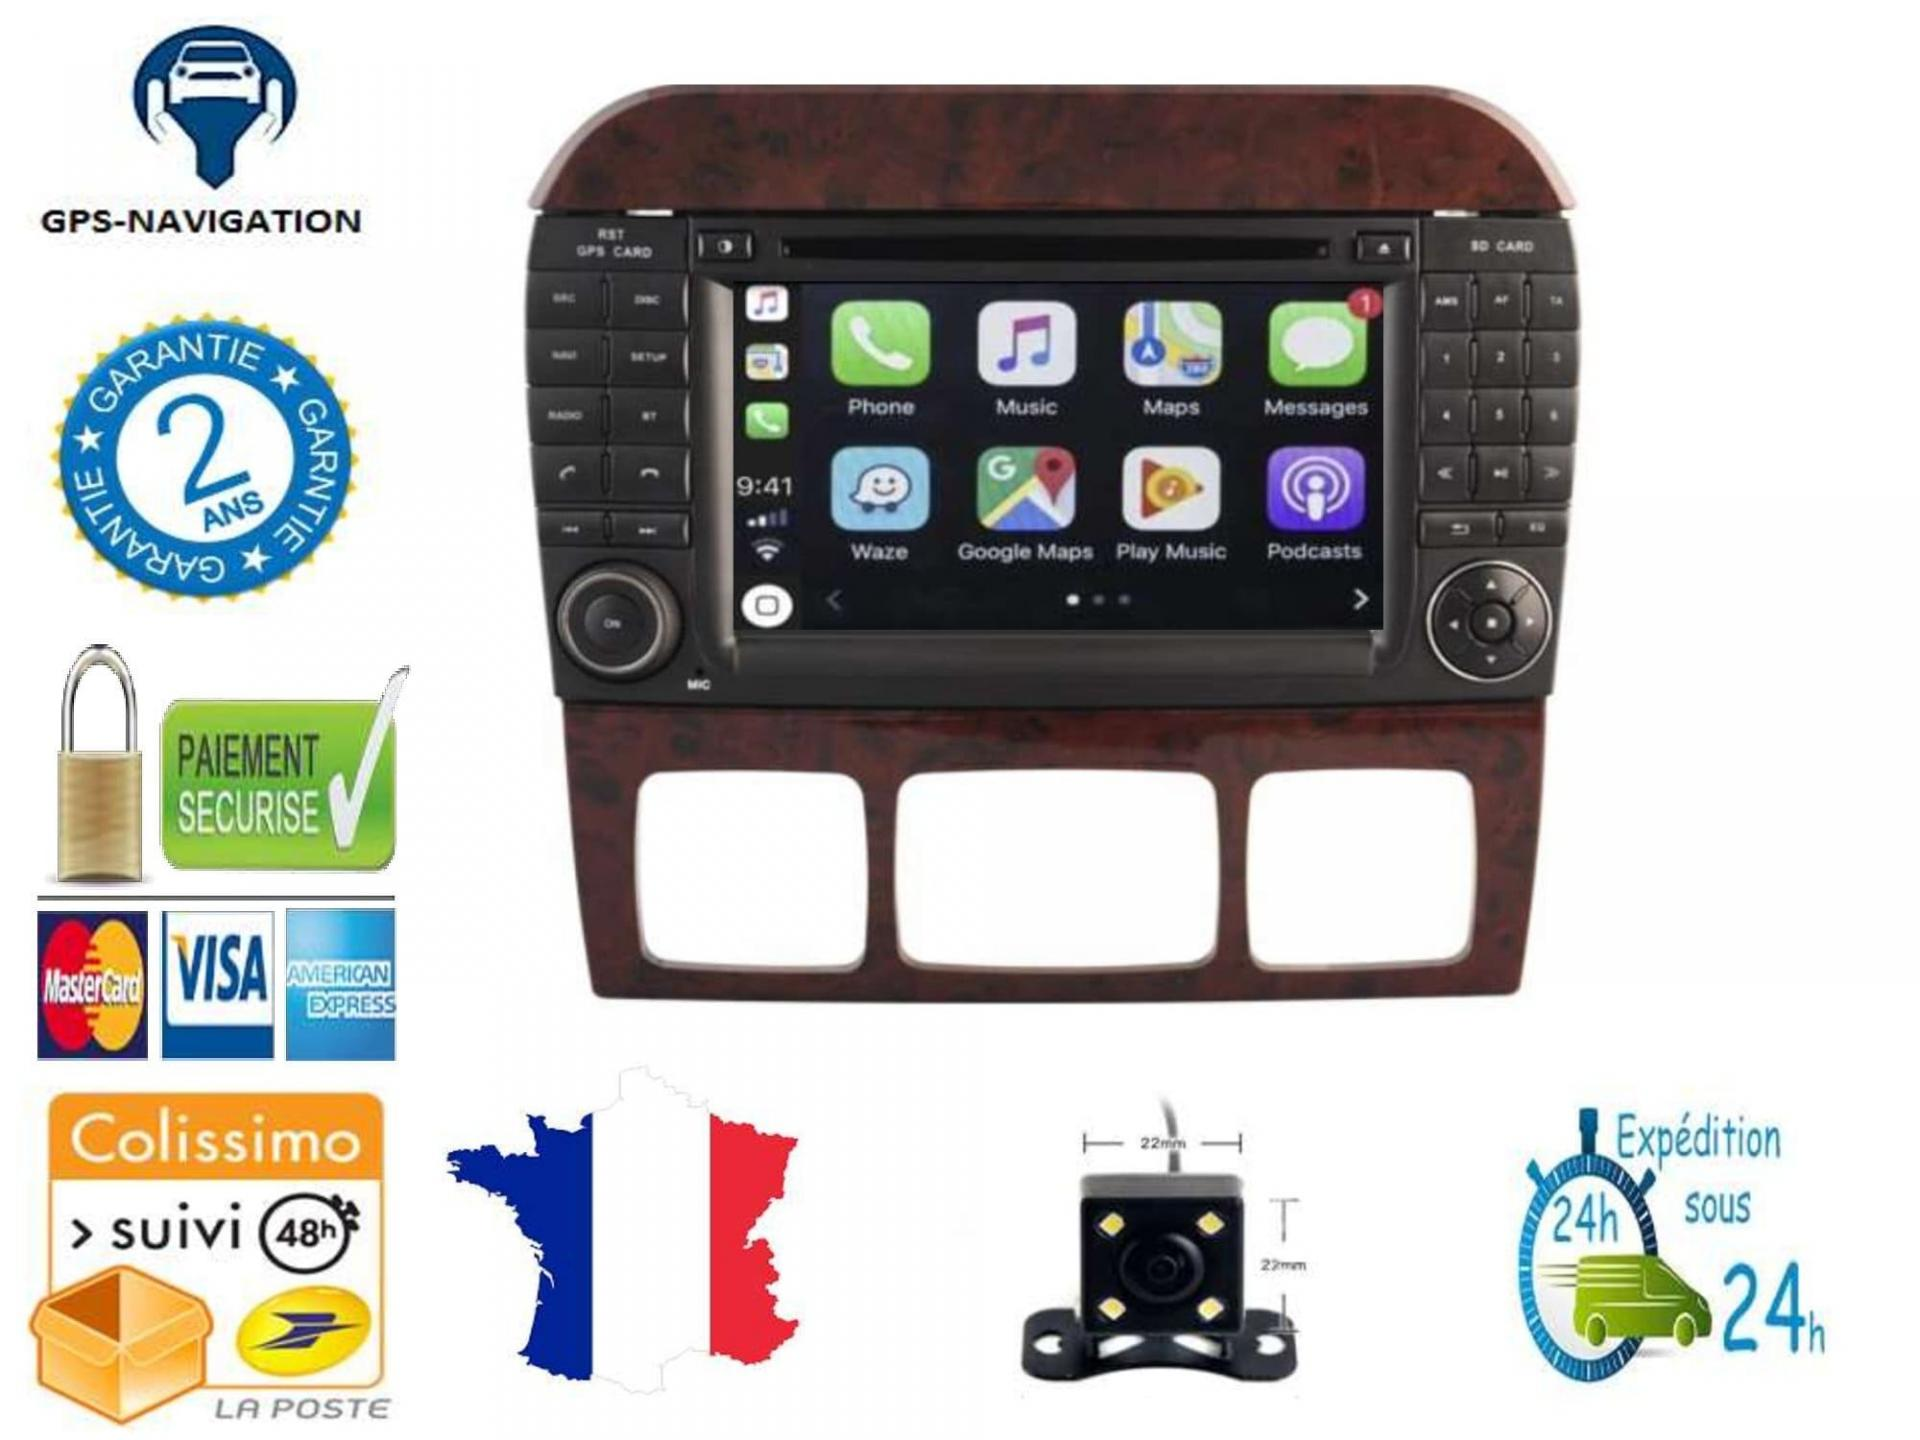 Autoradio gps carplay android auto gps bluetooth mercedes classe s w220 classe cl w215 2